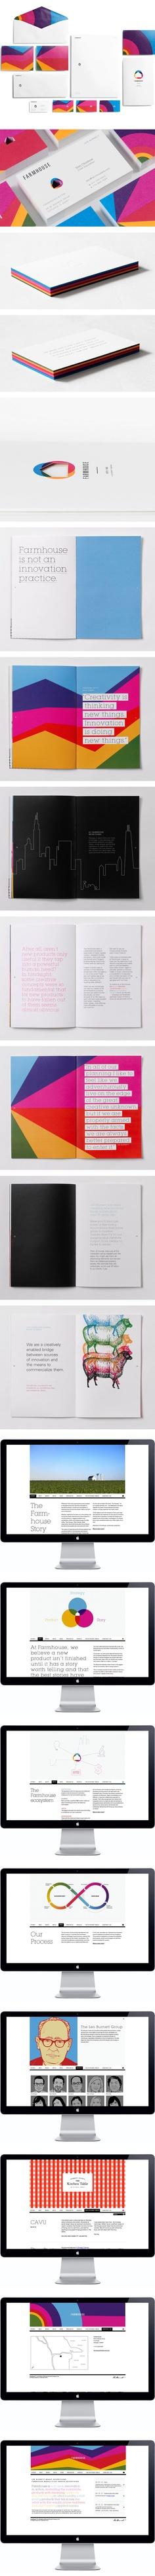 Bright and colorful identity: Farmhouse identity Corporate Design, Corporate Identity, Identity Design, Visual Identity, Brand Identity, Web Design, Logo Design, Brand Guidelines, Graphic Design Inspiration